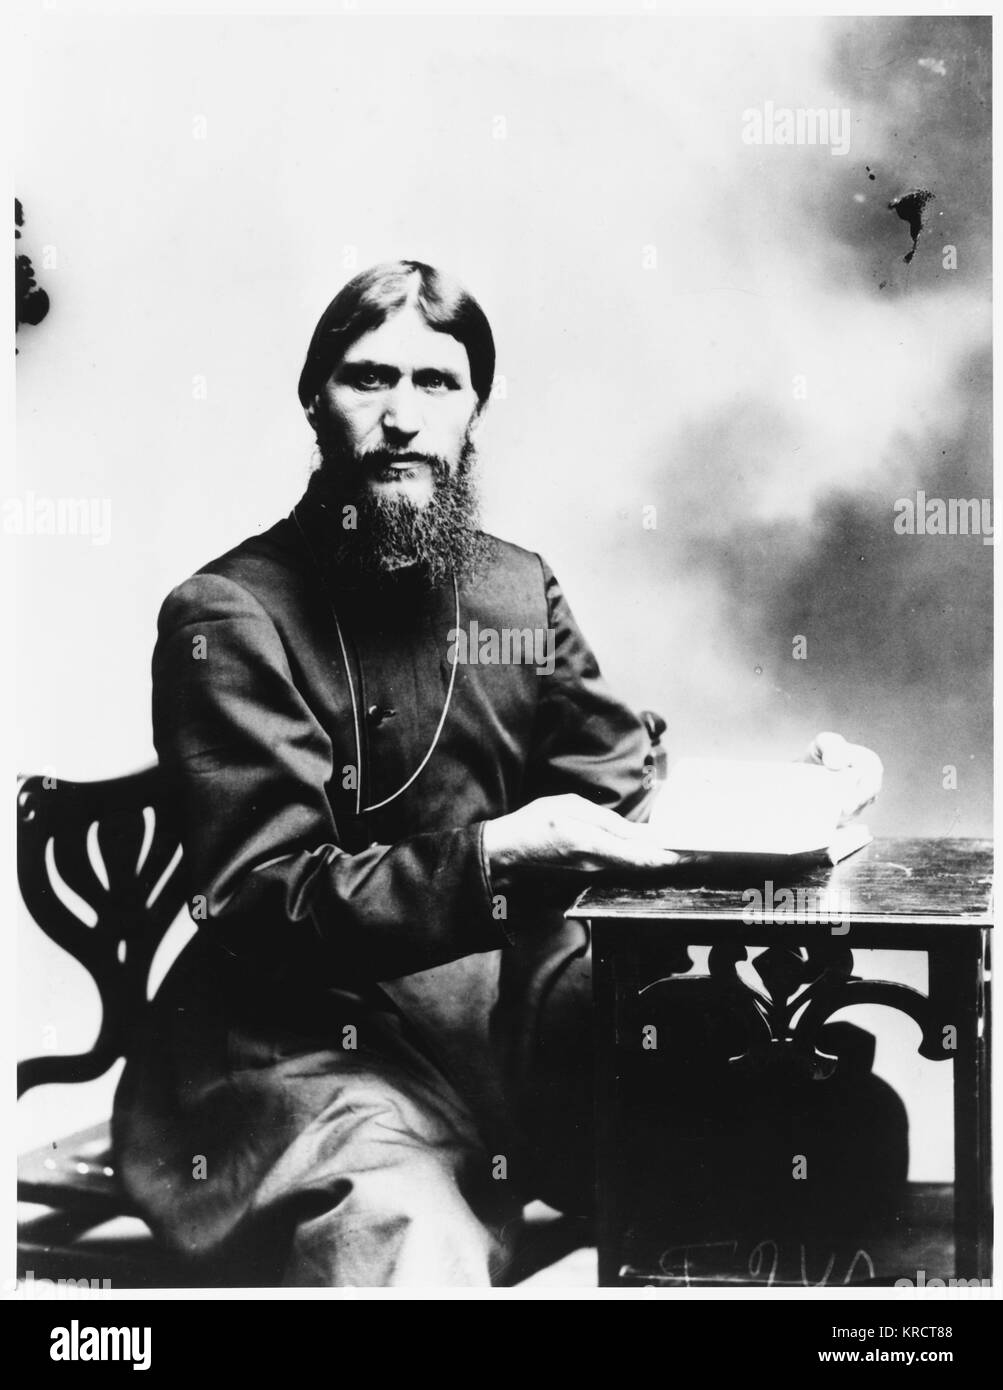 GRIGORI RASPUTIN Russian mystic and court favourite Date: 1872 - 1916 - Stock Image